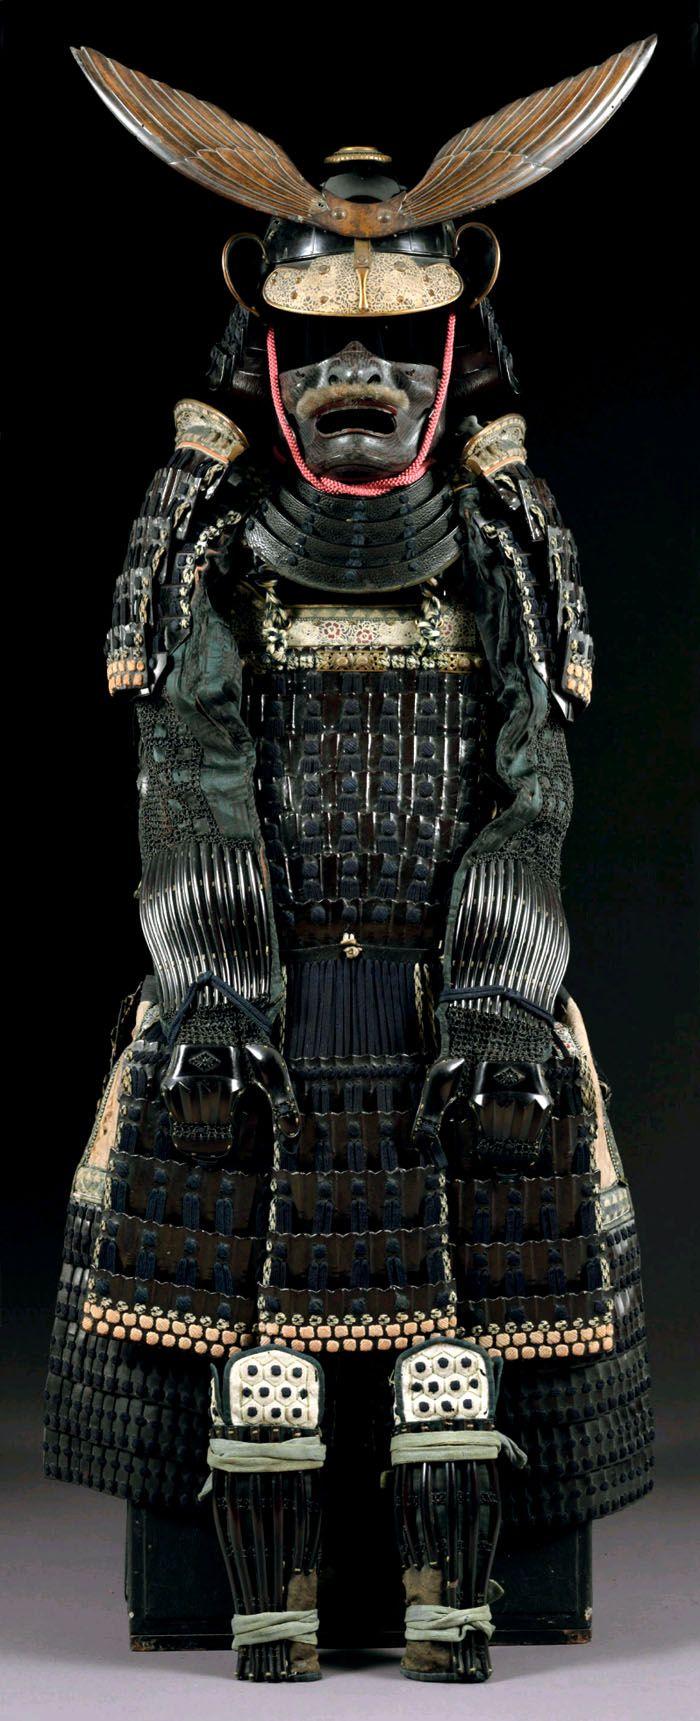 Blue Laced Rokumai Do Gusoku. Edo period (18th century). The Kabuto bowl of four heavy iron plates and lacquered black. A Rokumai do (six-piece cuirass) of yahazu-shaped lamellae applied with stenciled doeskin munaita.  Accompanied by a certificate of registration as Koshu tokubetsu kicho shiryo (Especially important armor object) no. 24 issued by the Nihon Katchu Bugu Kenkyu Hozon Kai (Japanese Armor Preservation Society)